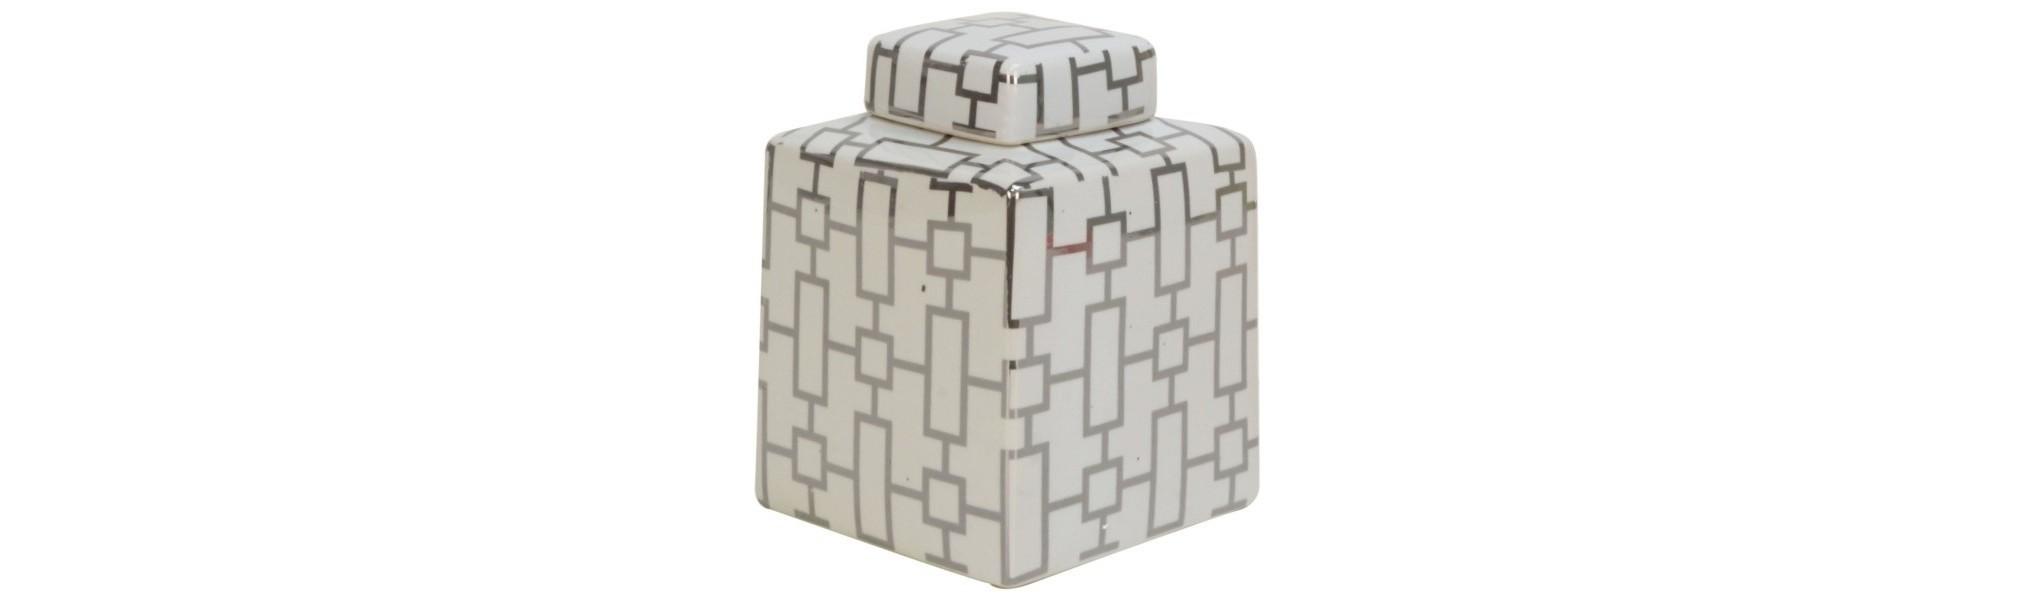 Декоративная ваза M-Style 15436670 от thefurnish